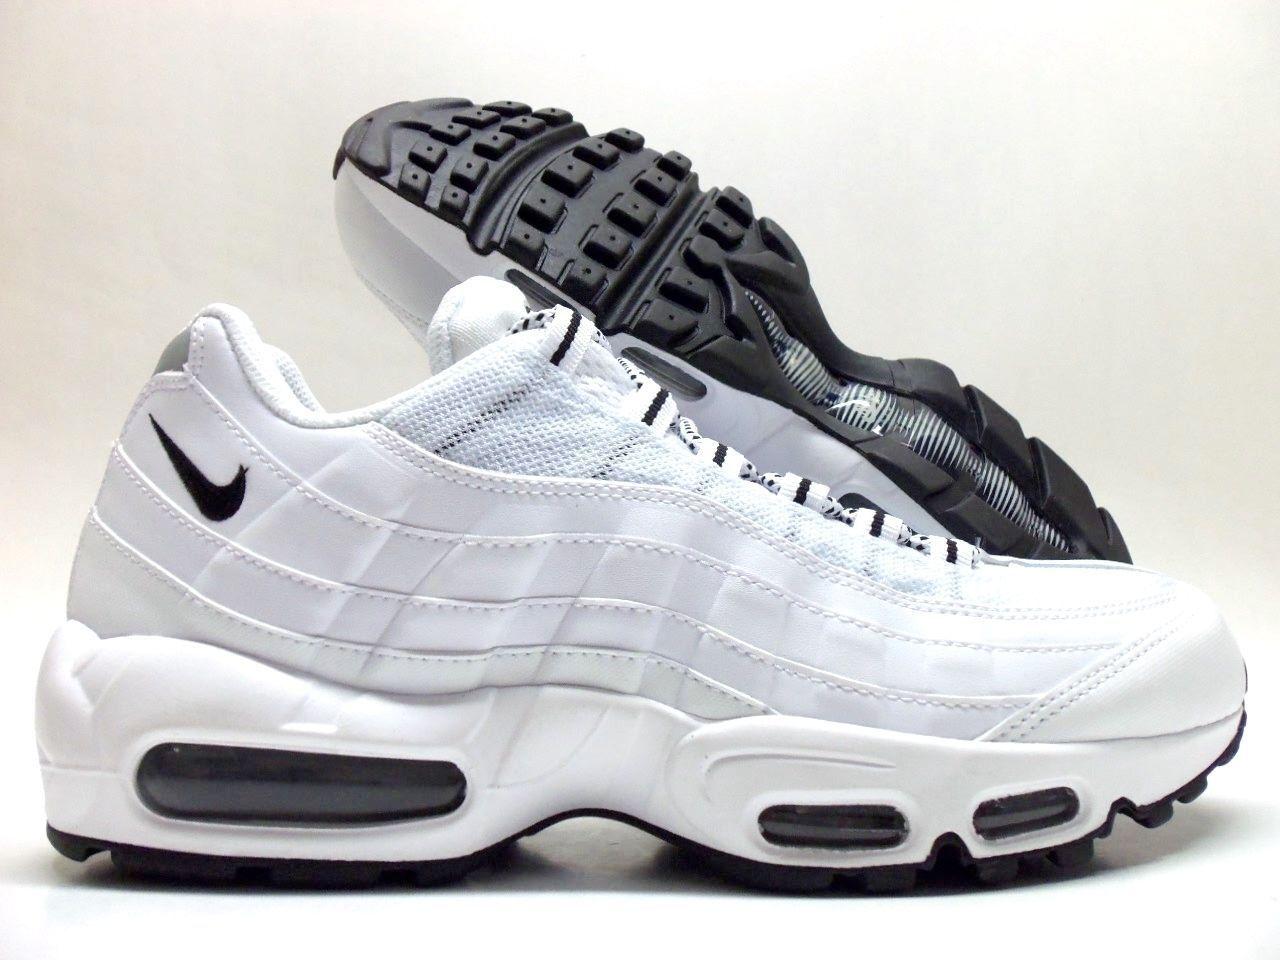 NIKE AIR MAX '95 Running Shoes WHITE/BLACK-BLACK  MEN'S  609048-109 Sz 13